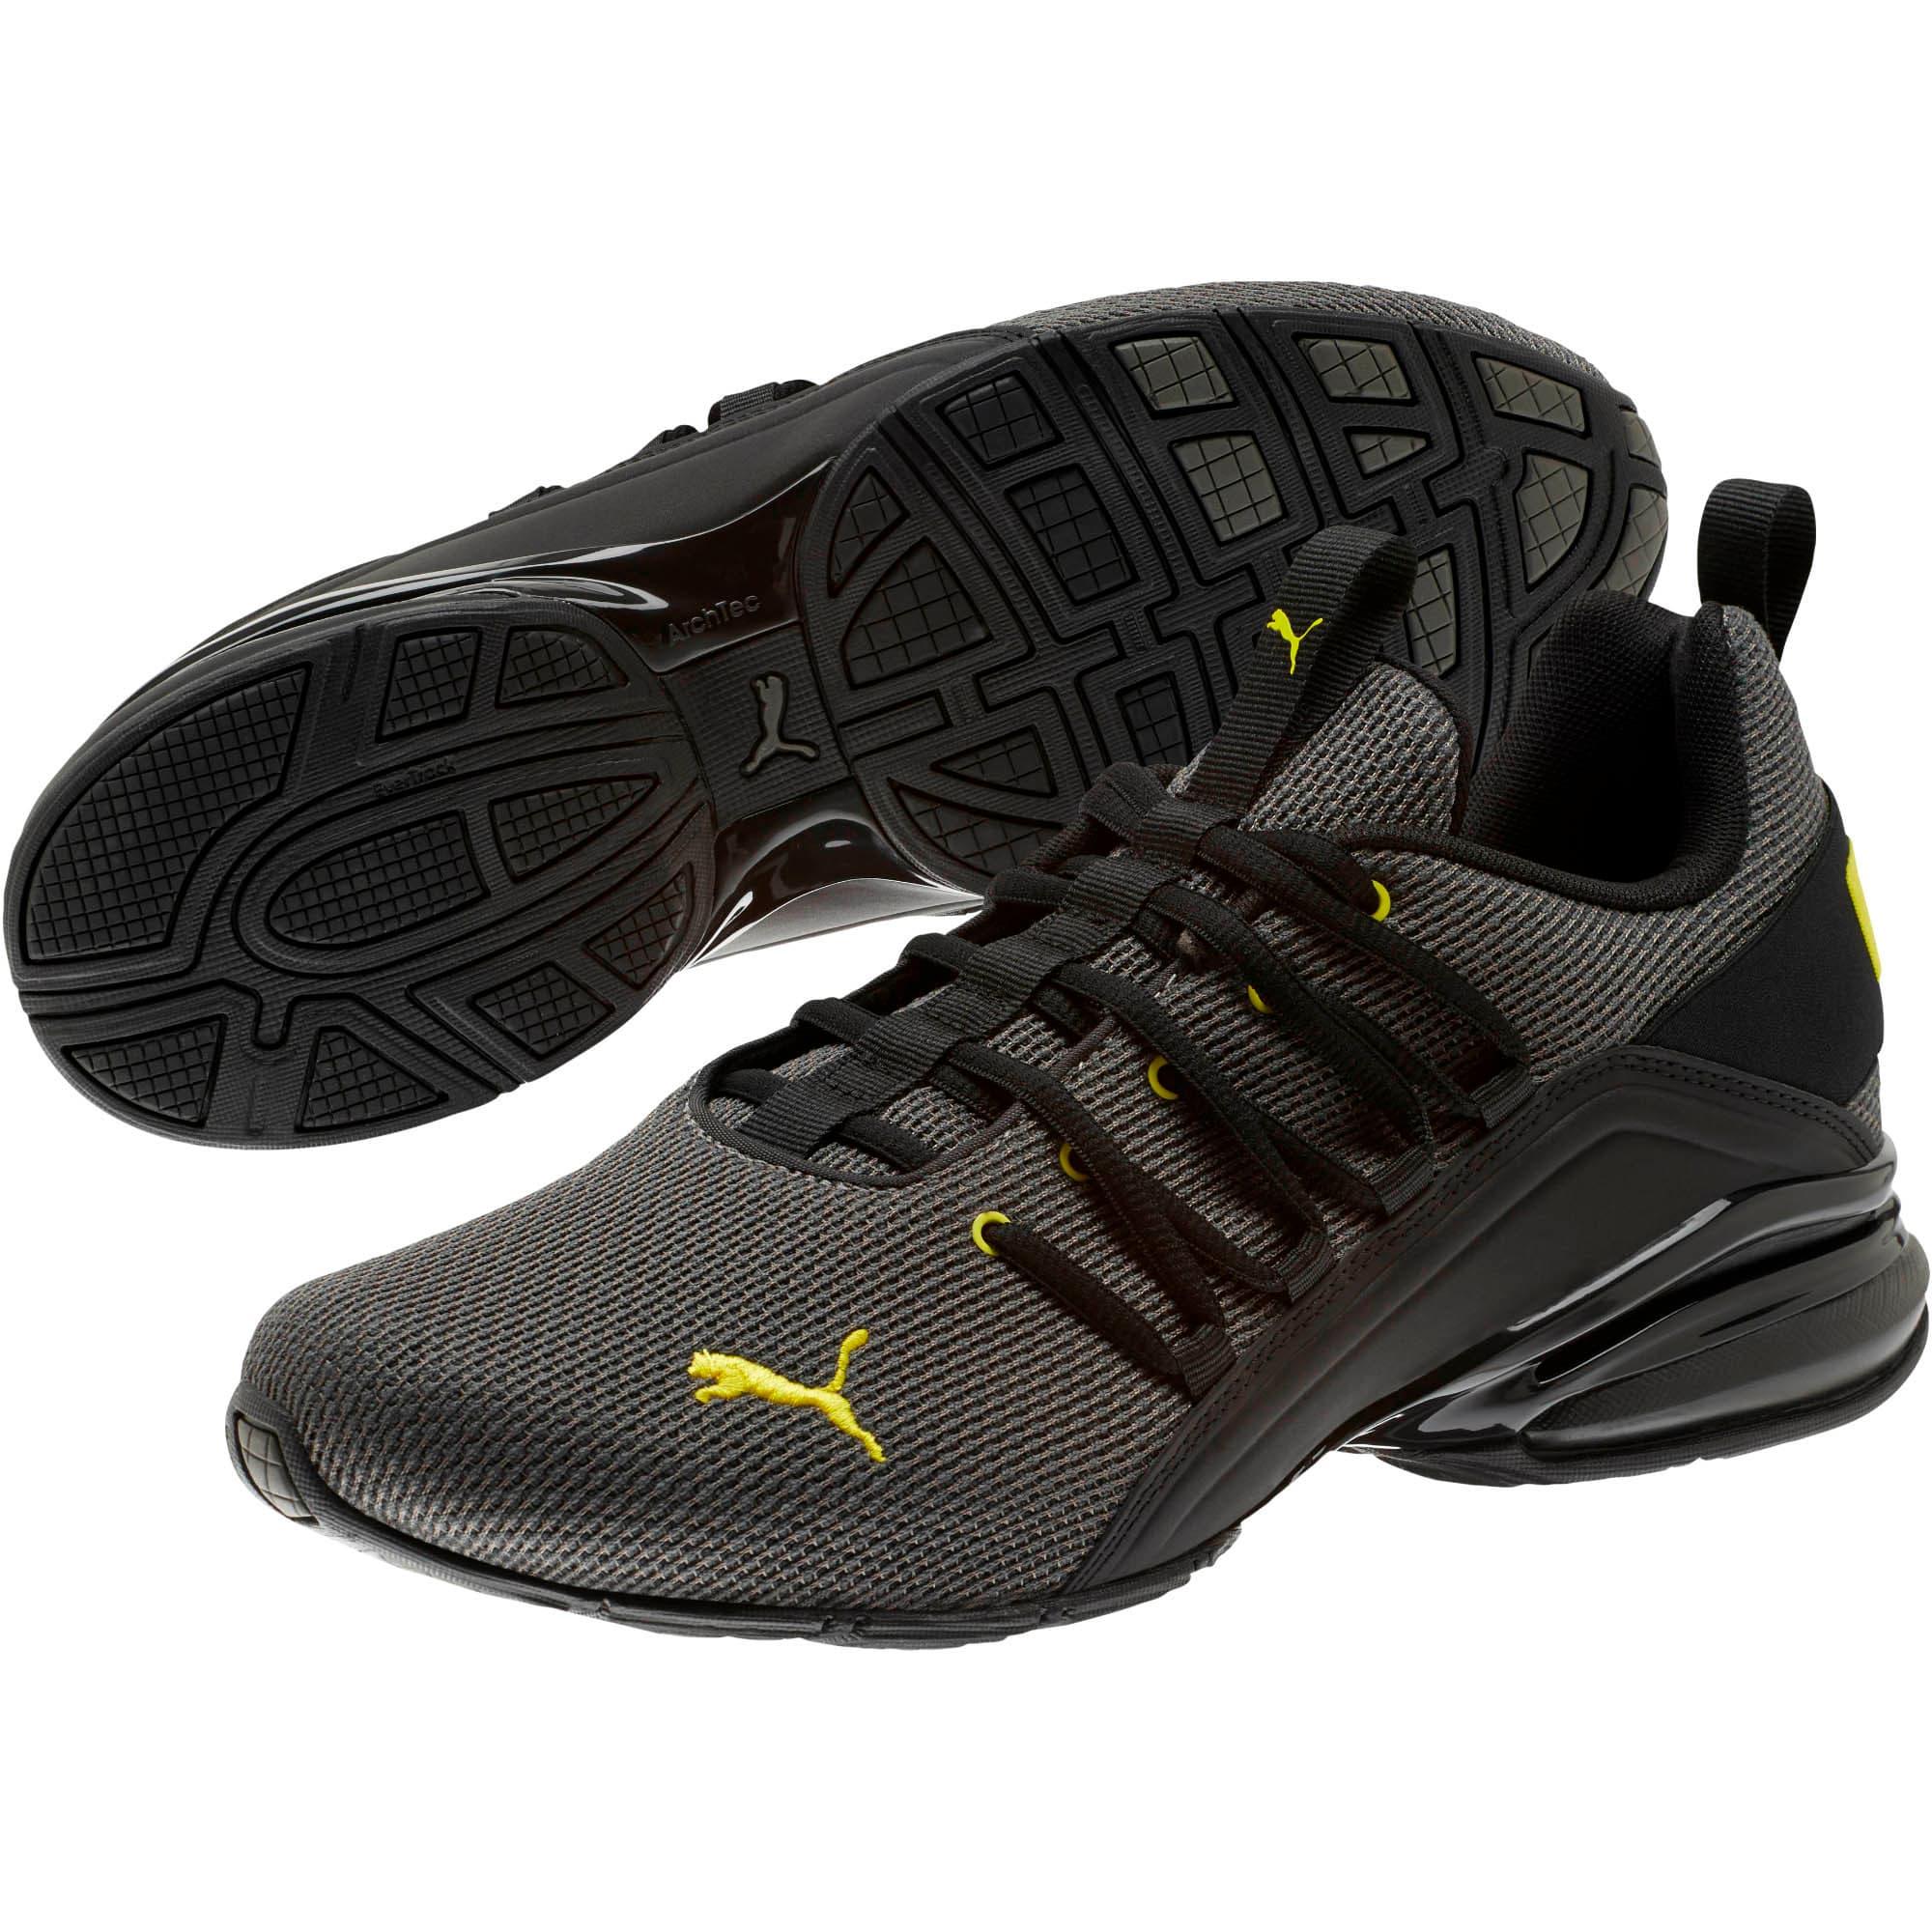 Thumbnail 2 of Axelion Mesh Men's Training Shoes, Charcoal Gray-Blazing Yellow, medium